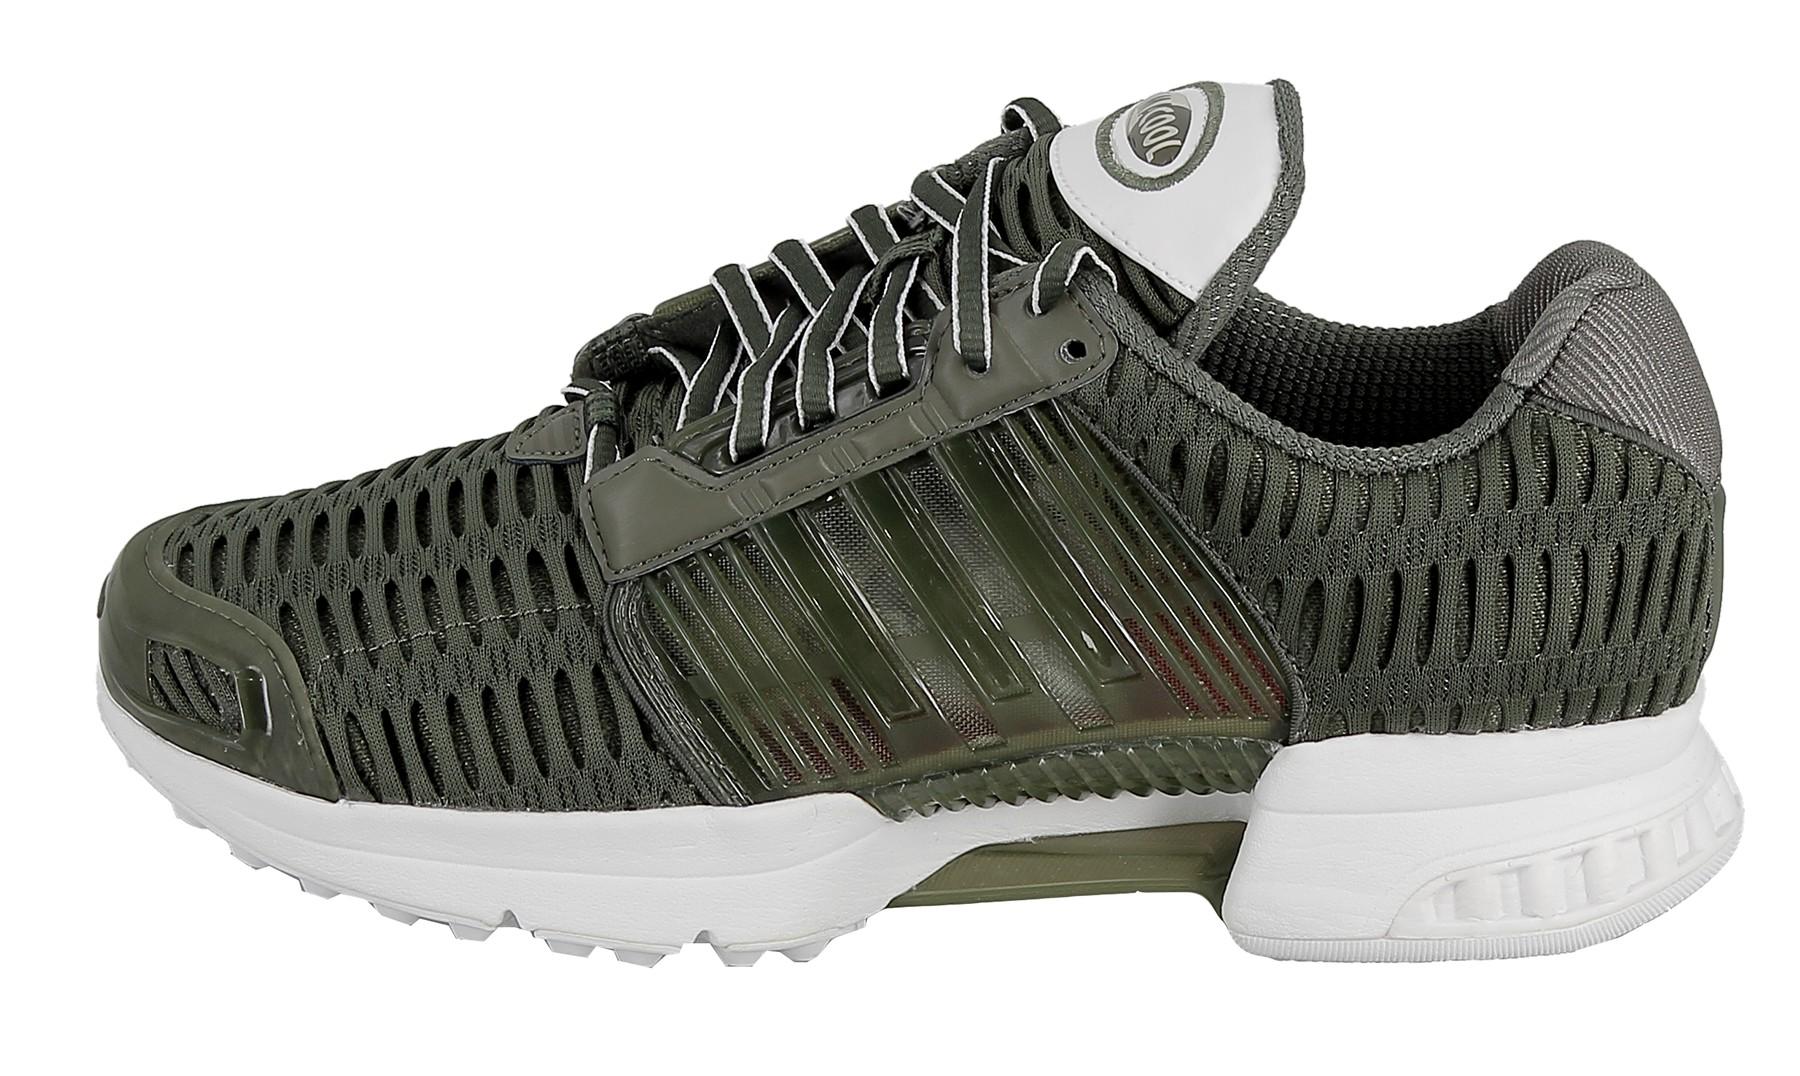 Basket adidas Originals Climacool 1 Ref. BA8577